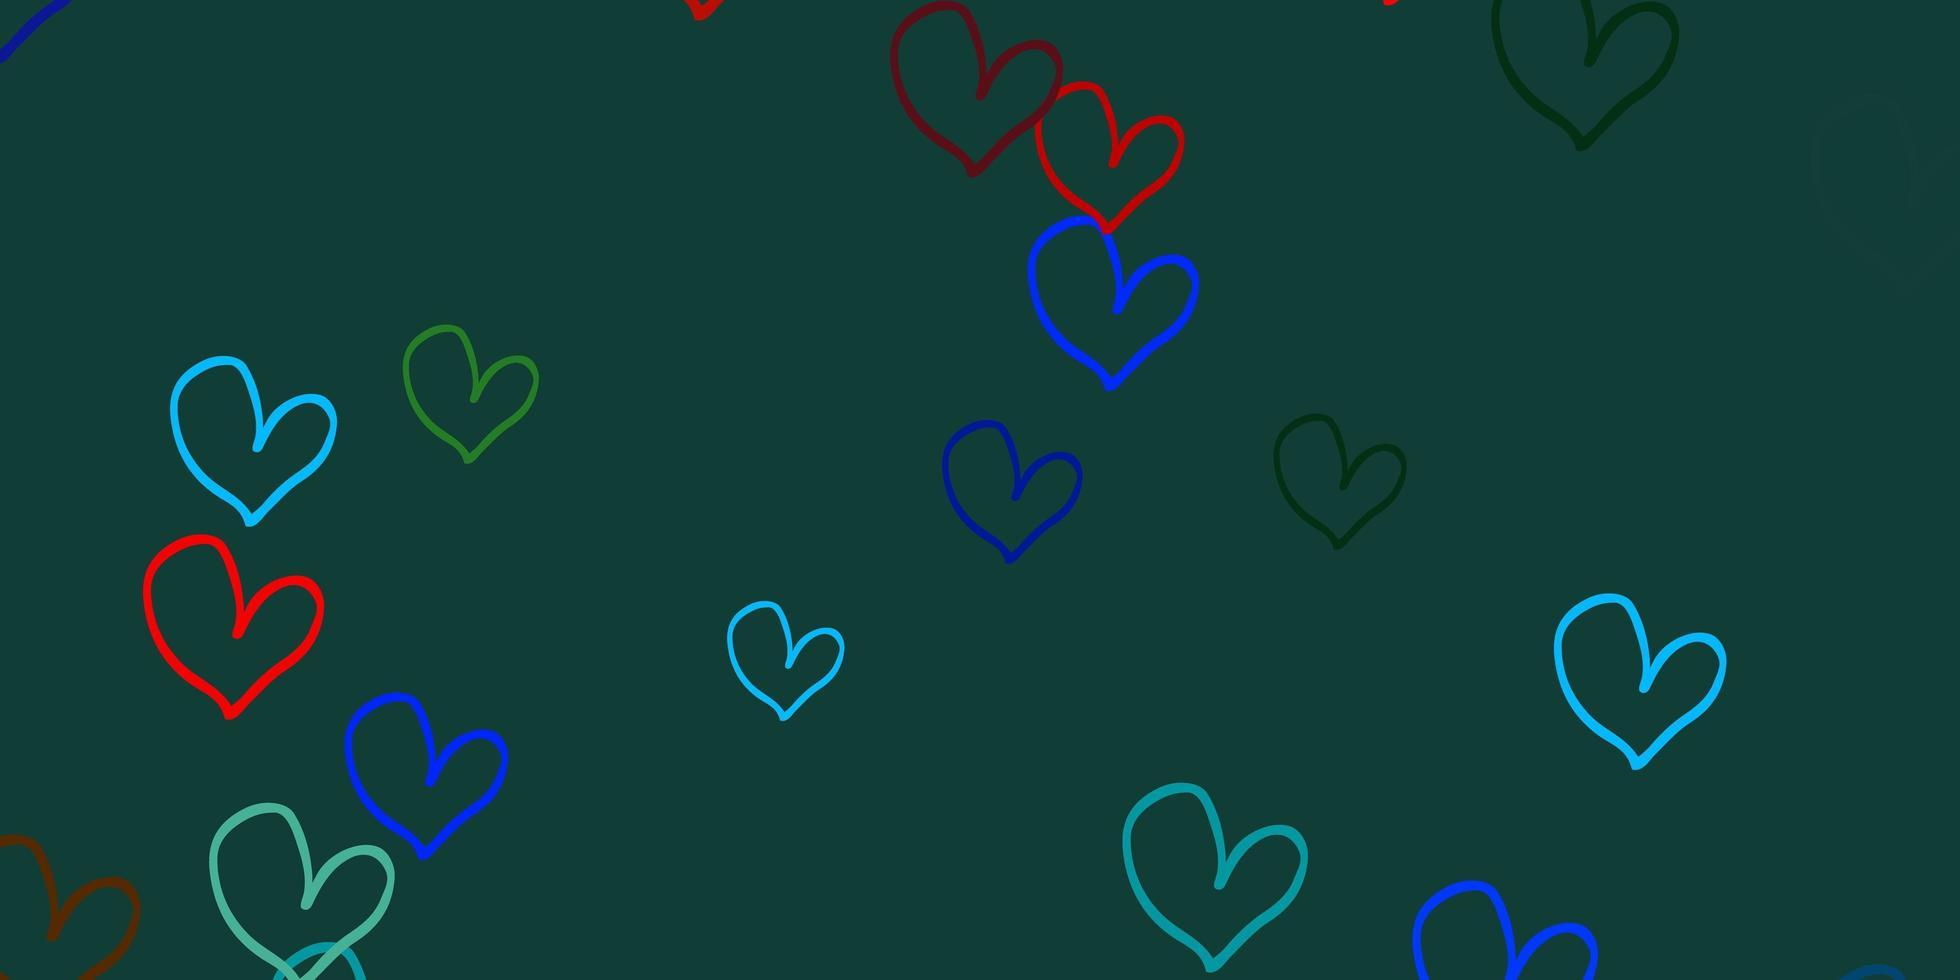 luz de fundo vector multicolor com corações.